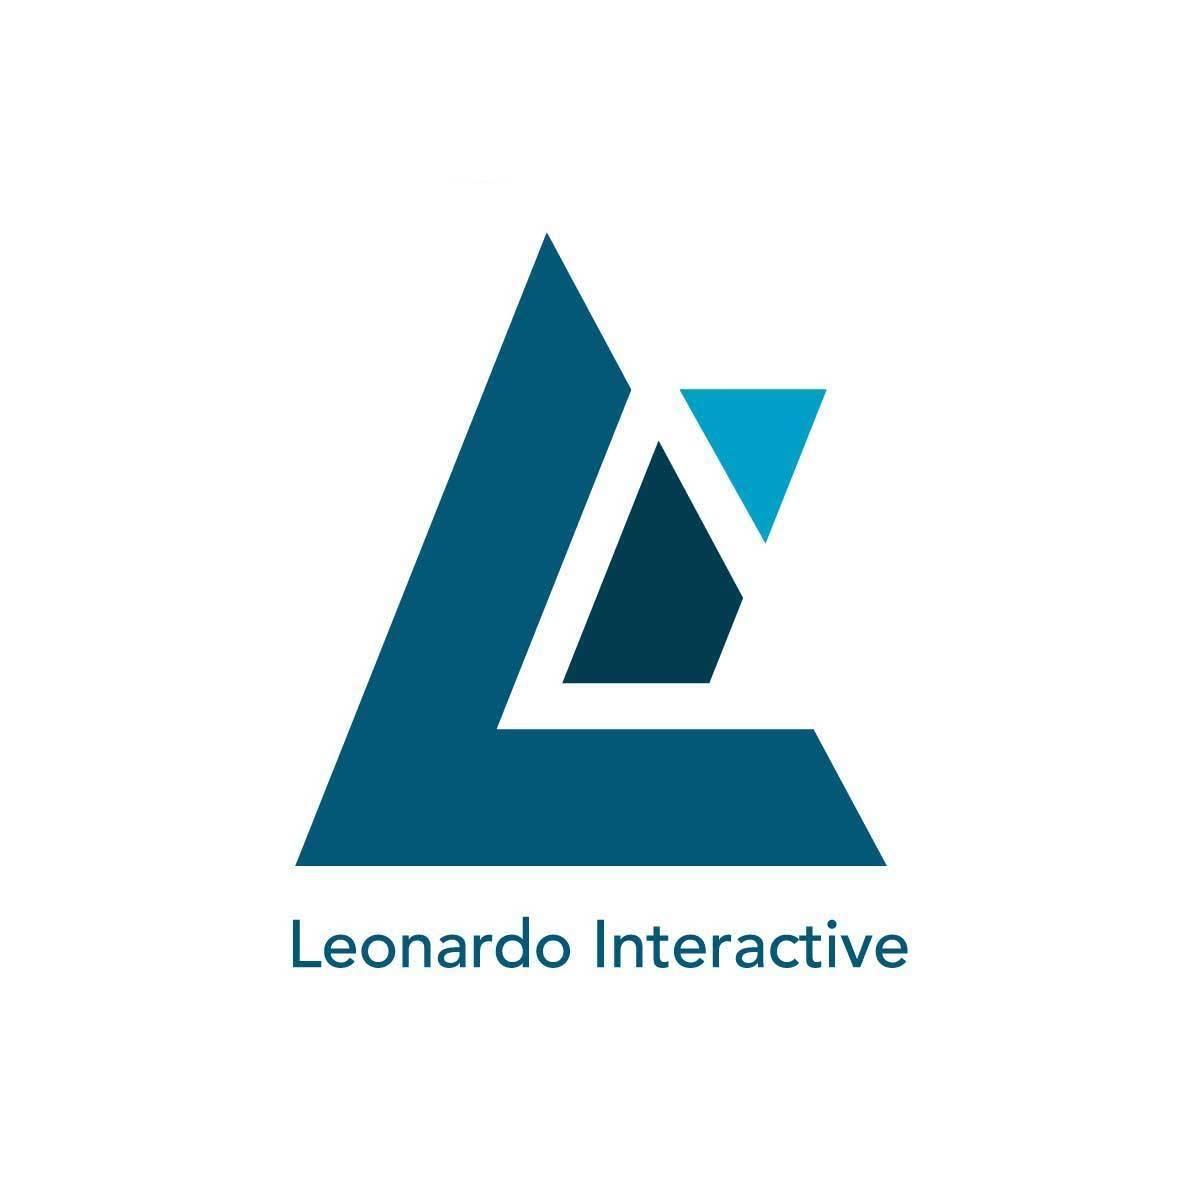 Leonardo Interactive